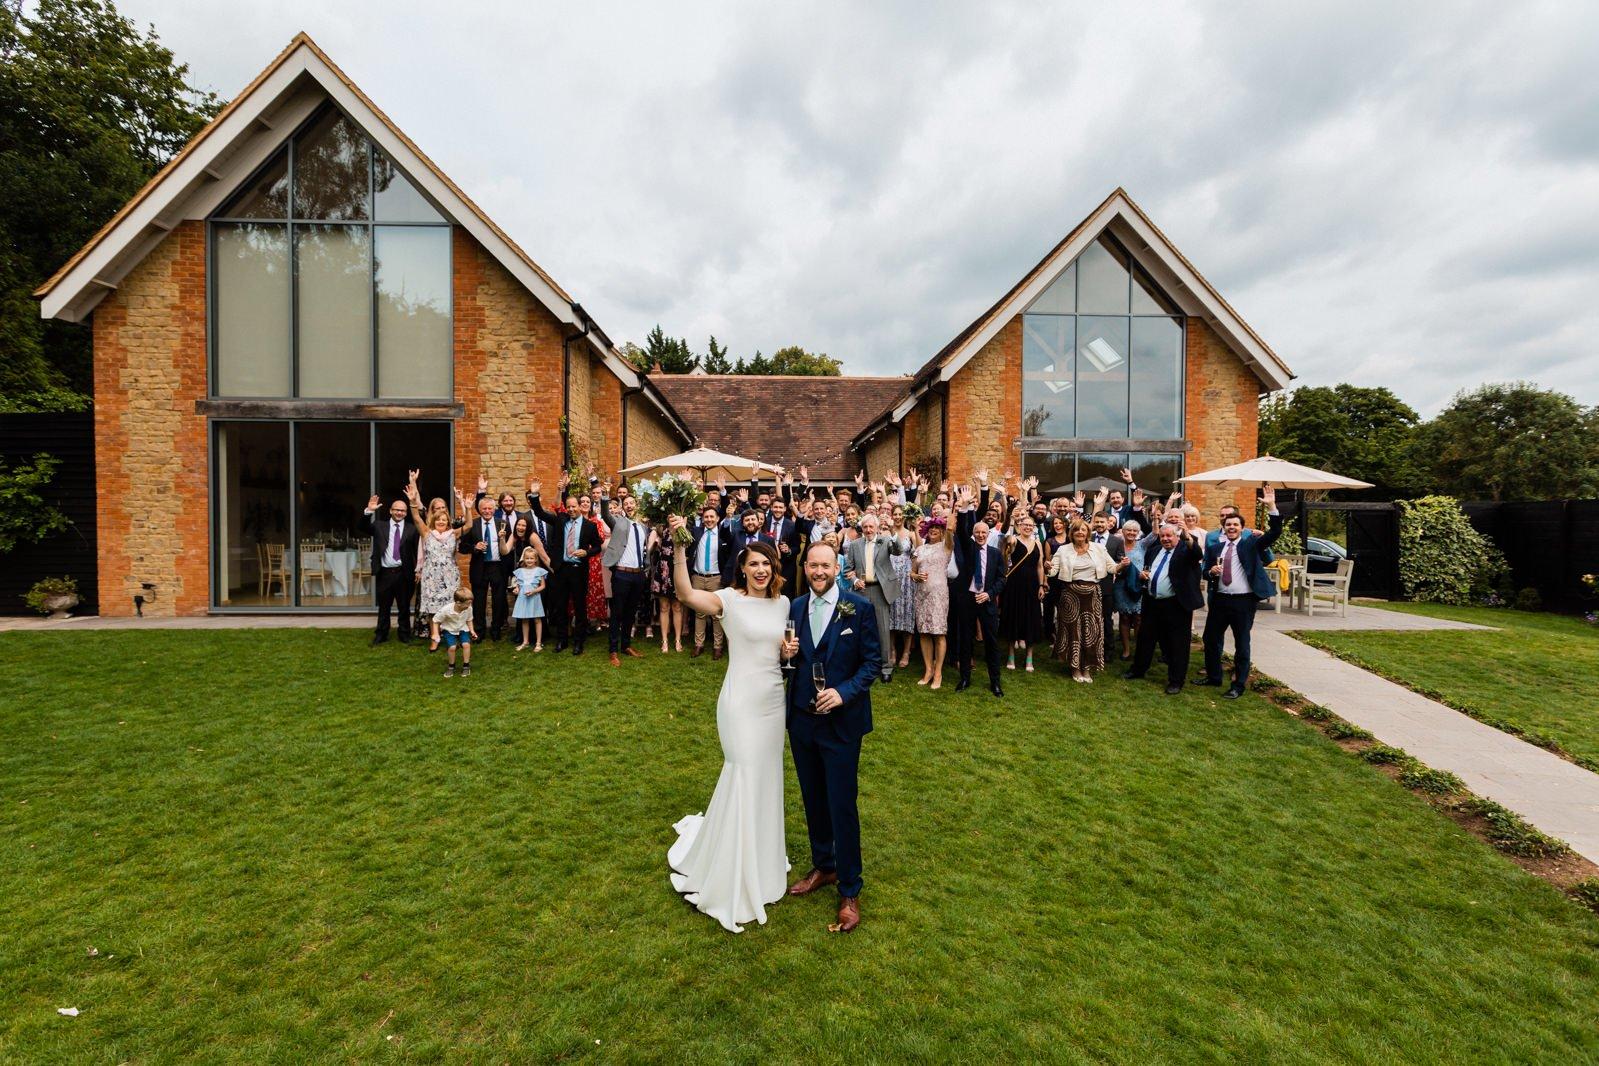 Millbridge Court Wedding - stunning summer wedding - wedding photography 68